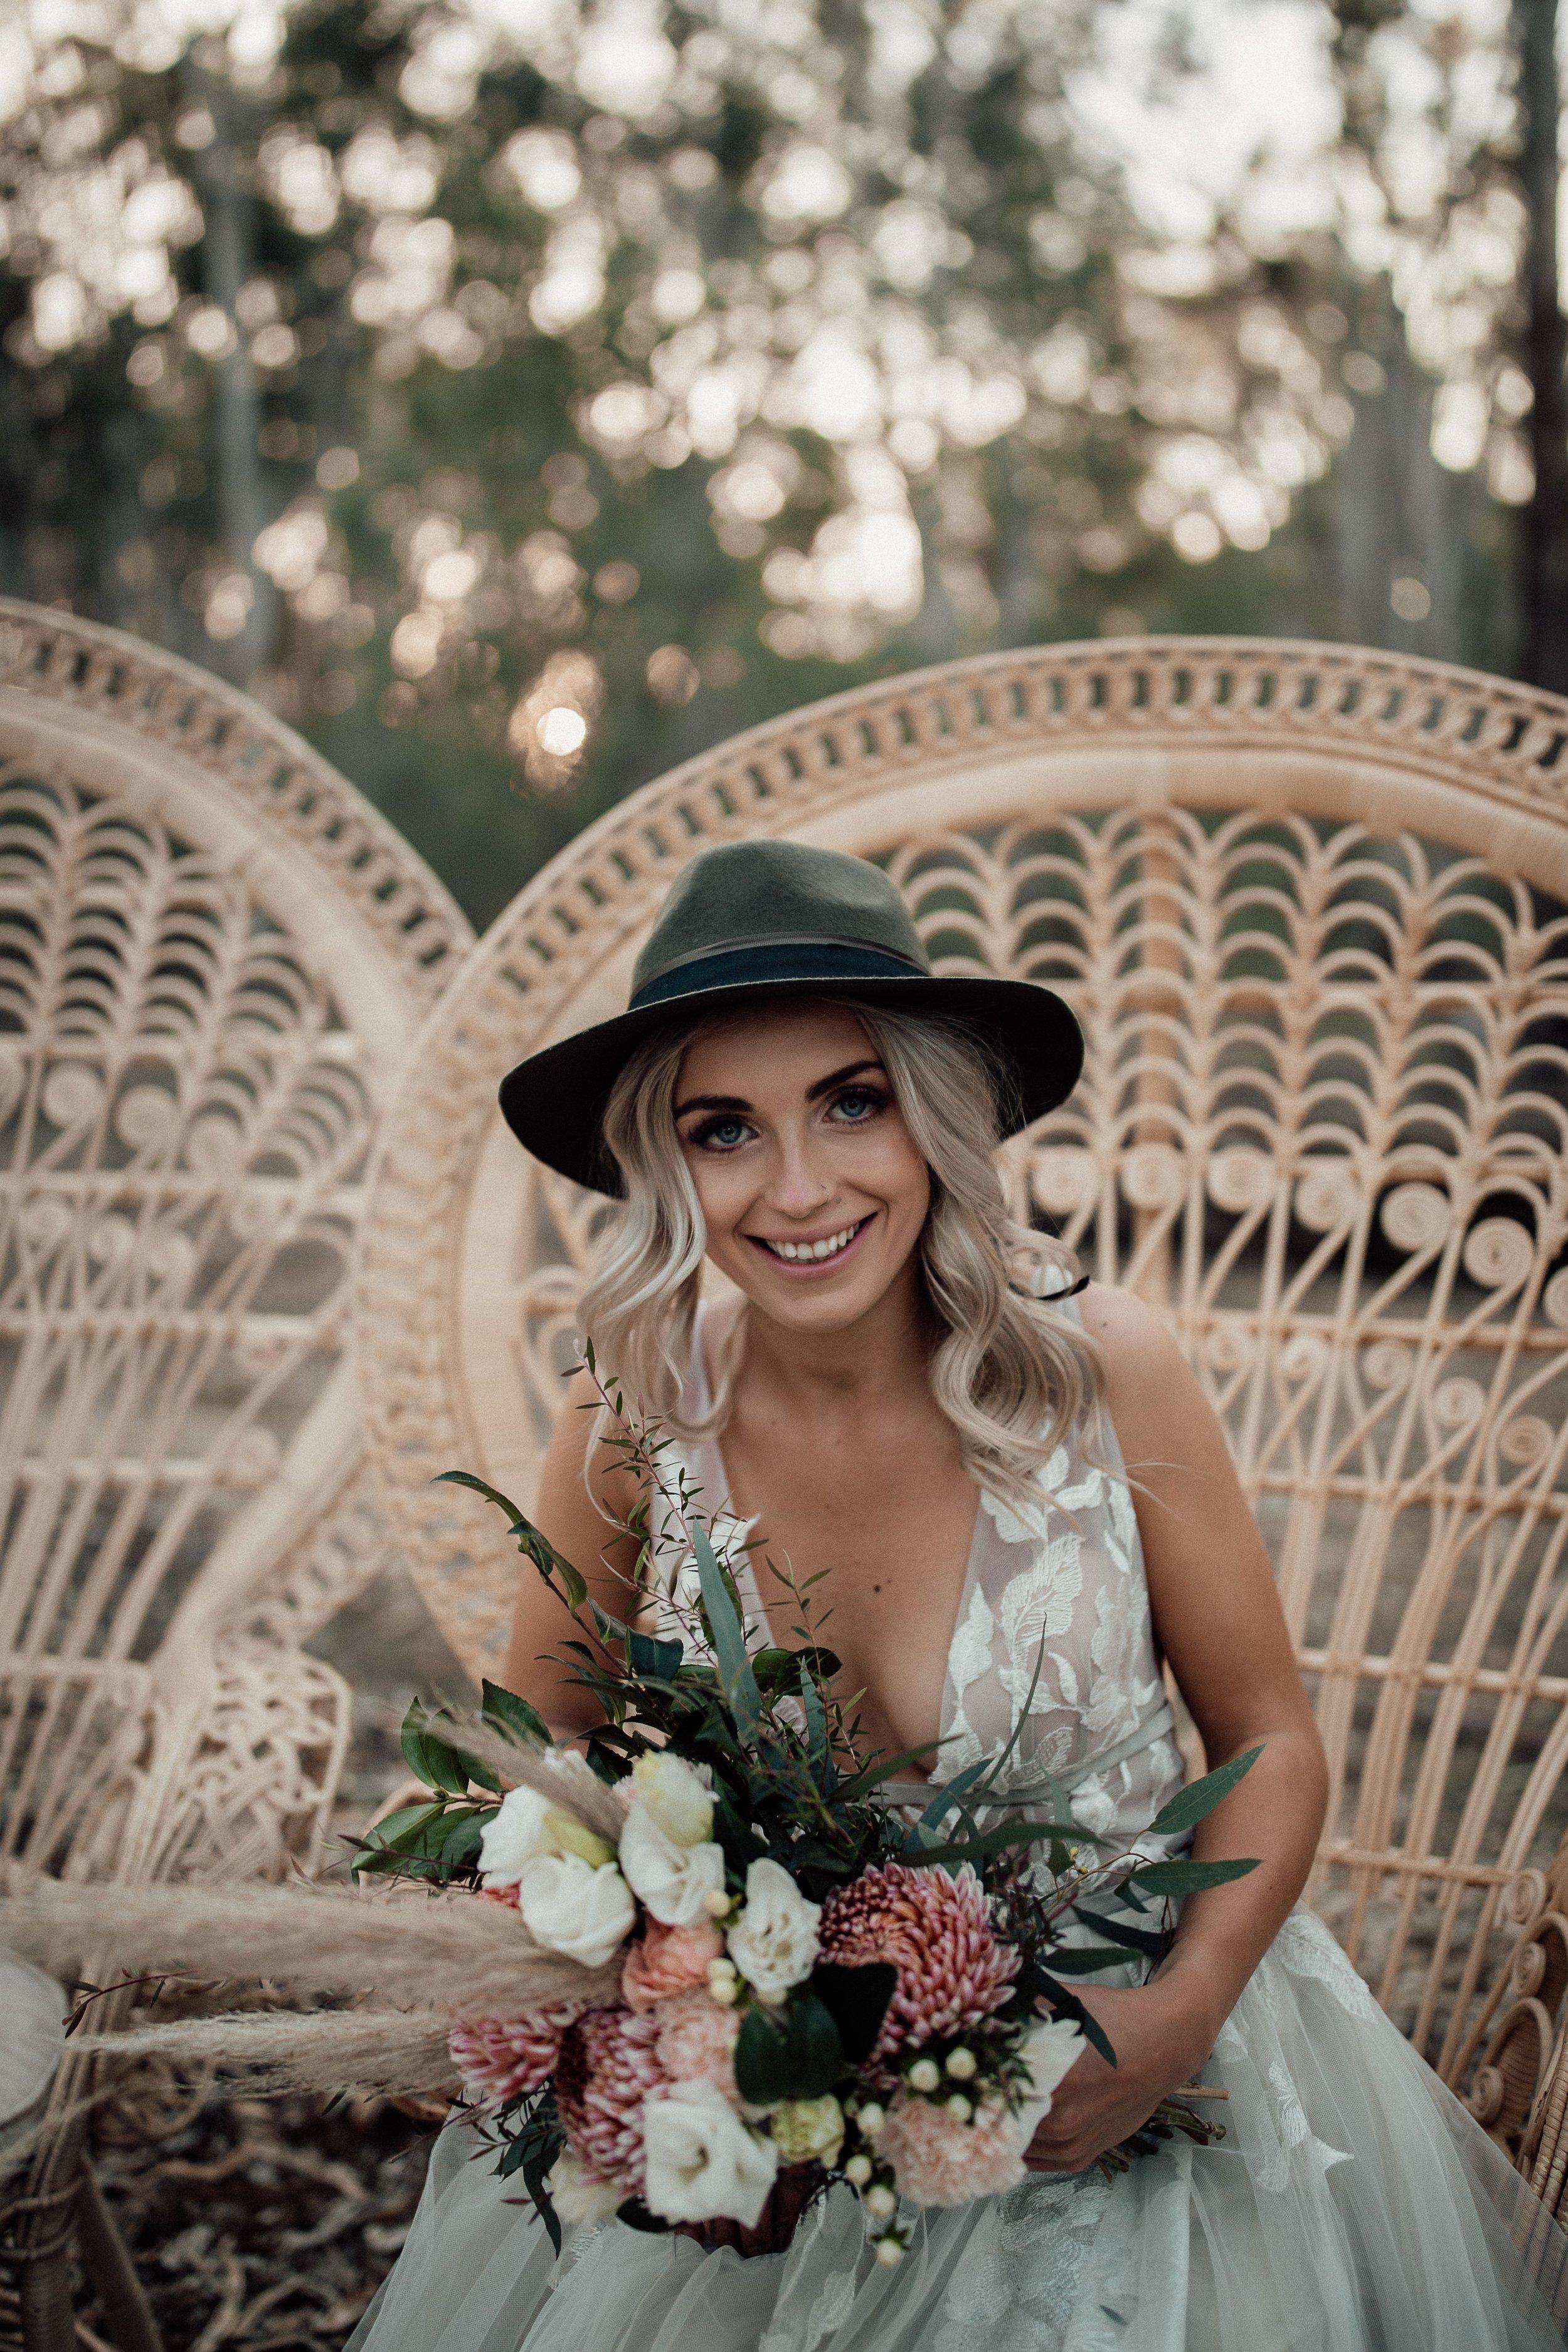 mickalathomas_puremacphotography_weddingphotographer_couplephotographer_Sheppartonphotographer_1499.jpg